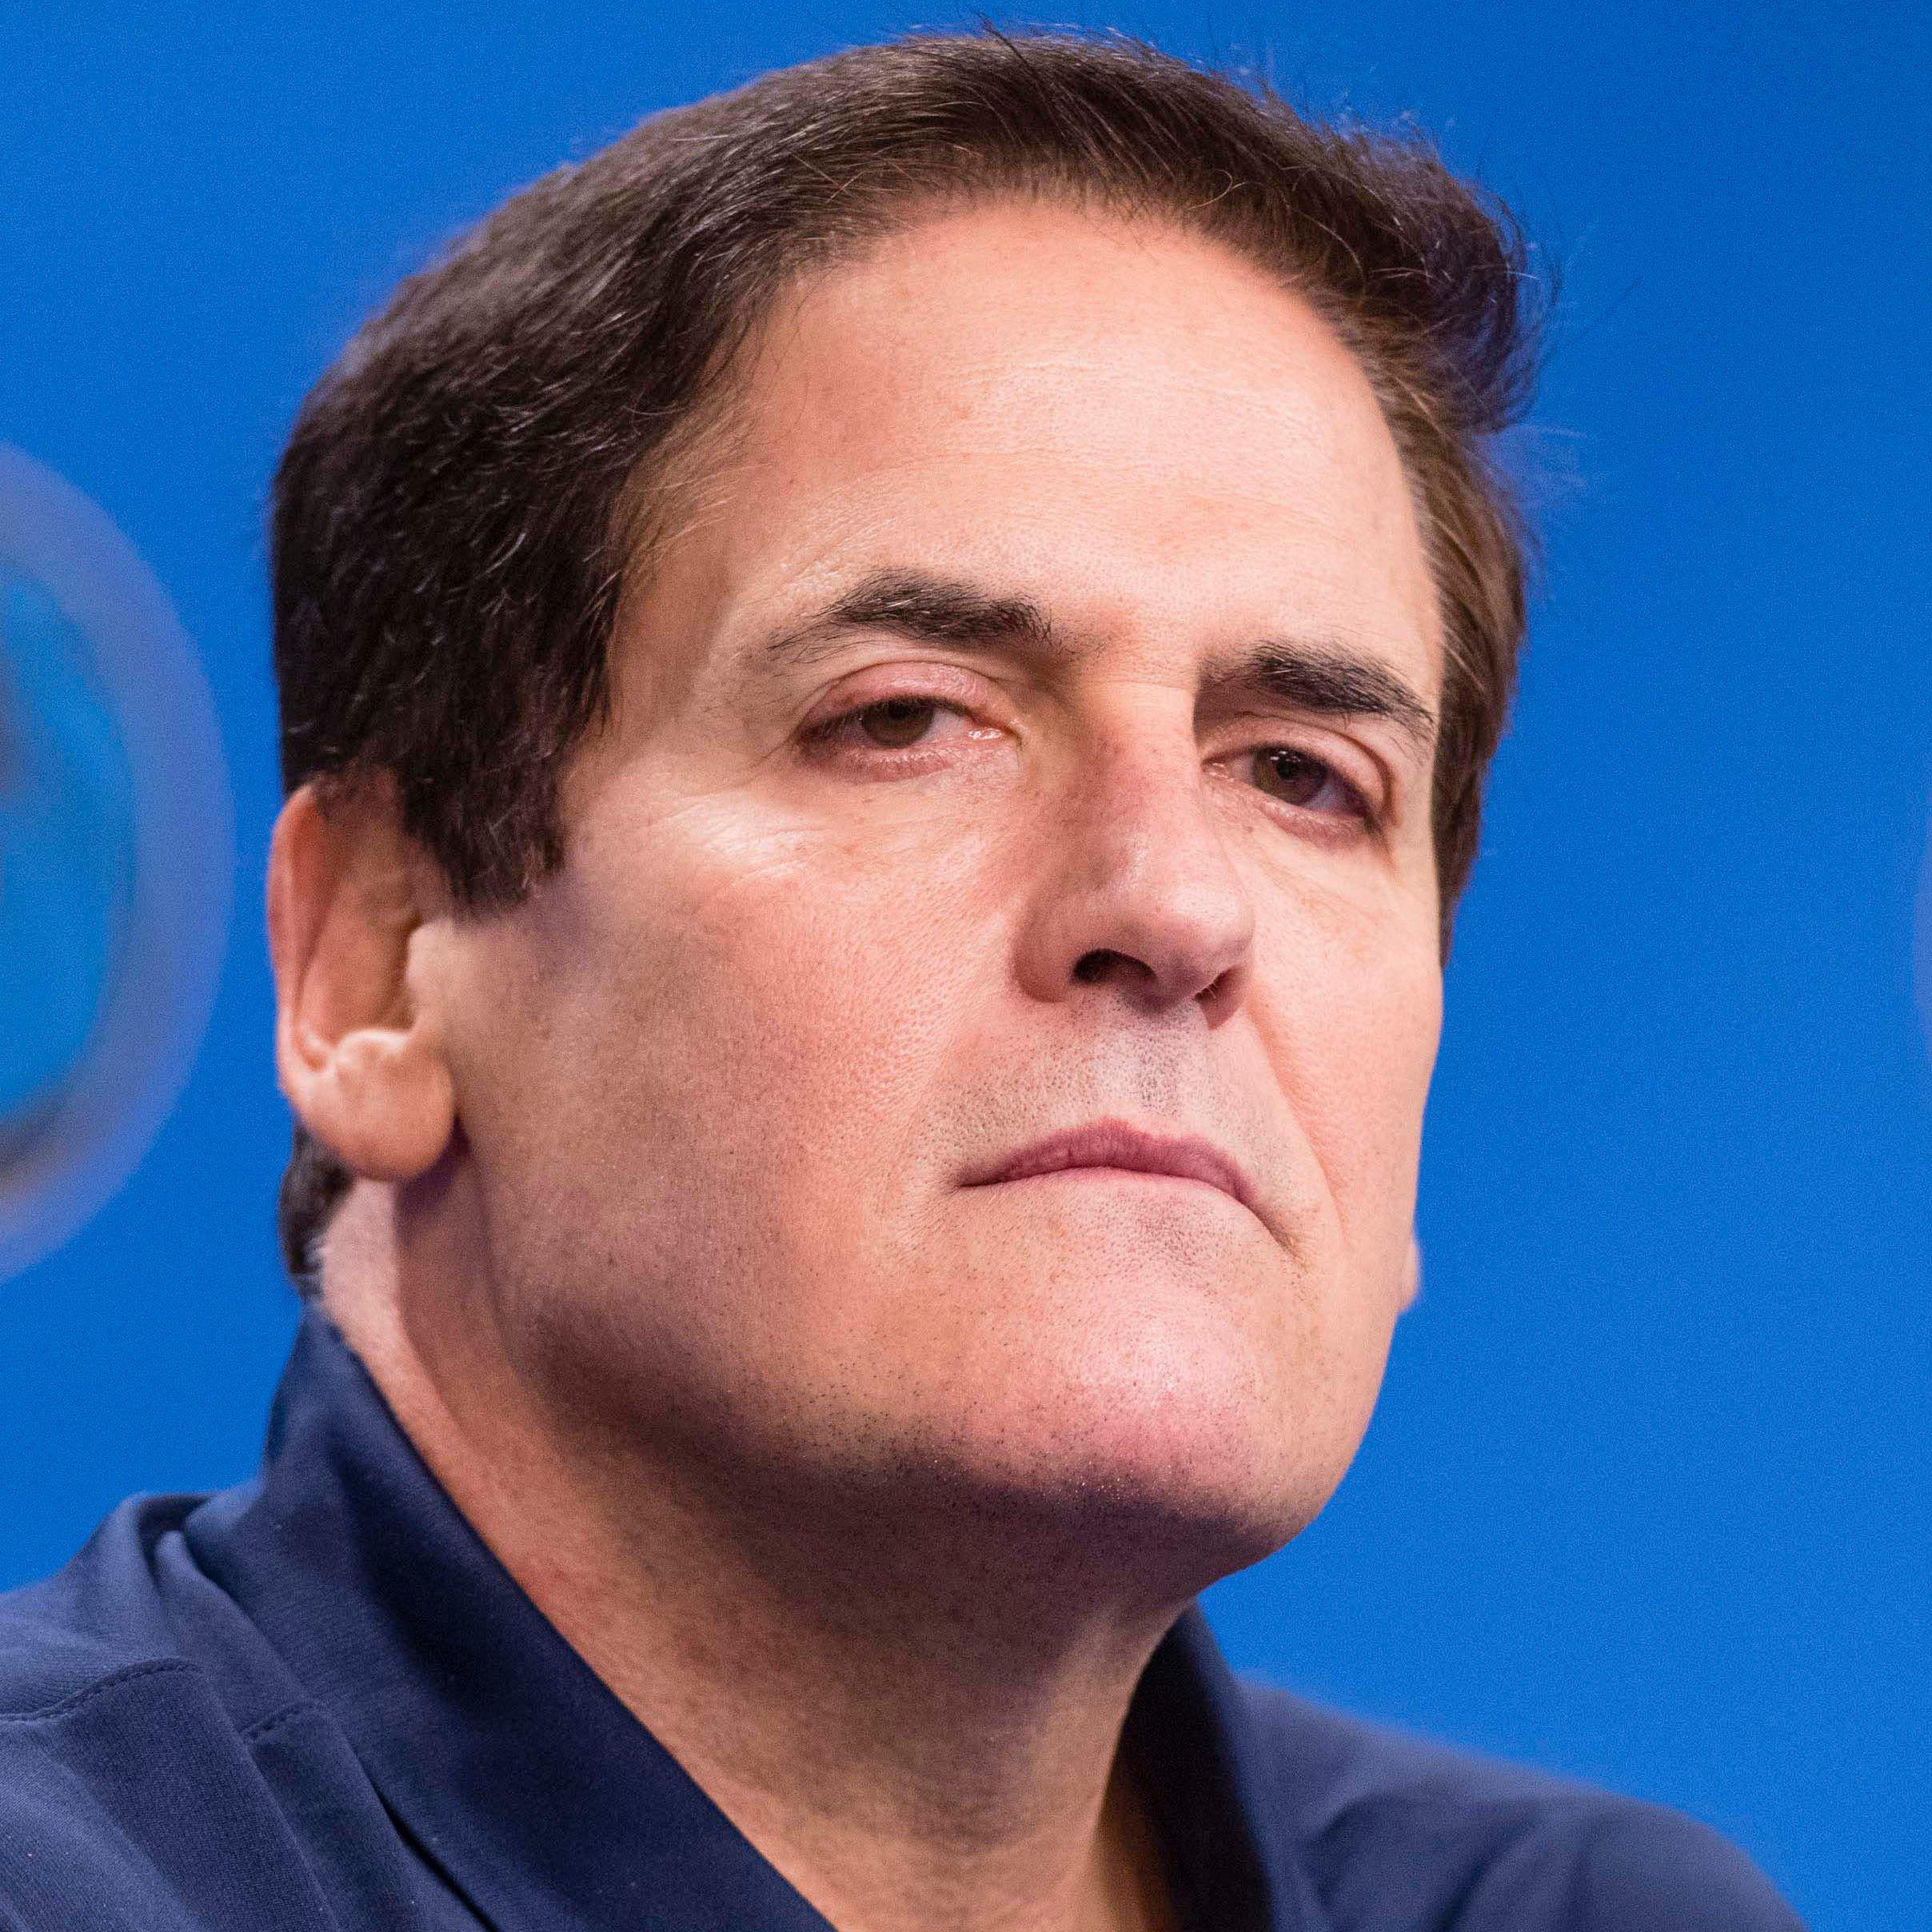 Mark Cuban will make $10M donation after Mavericks investigation reveals 'disturbing, heartbreaking' findings